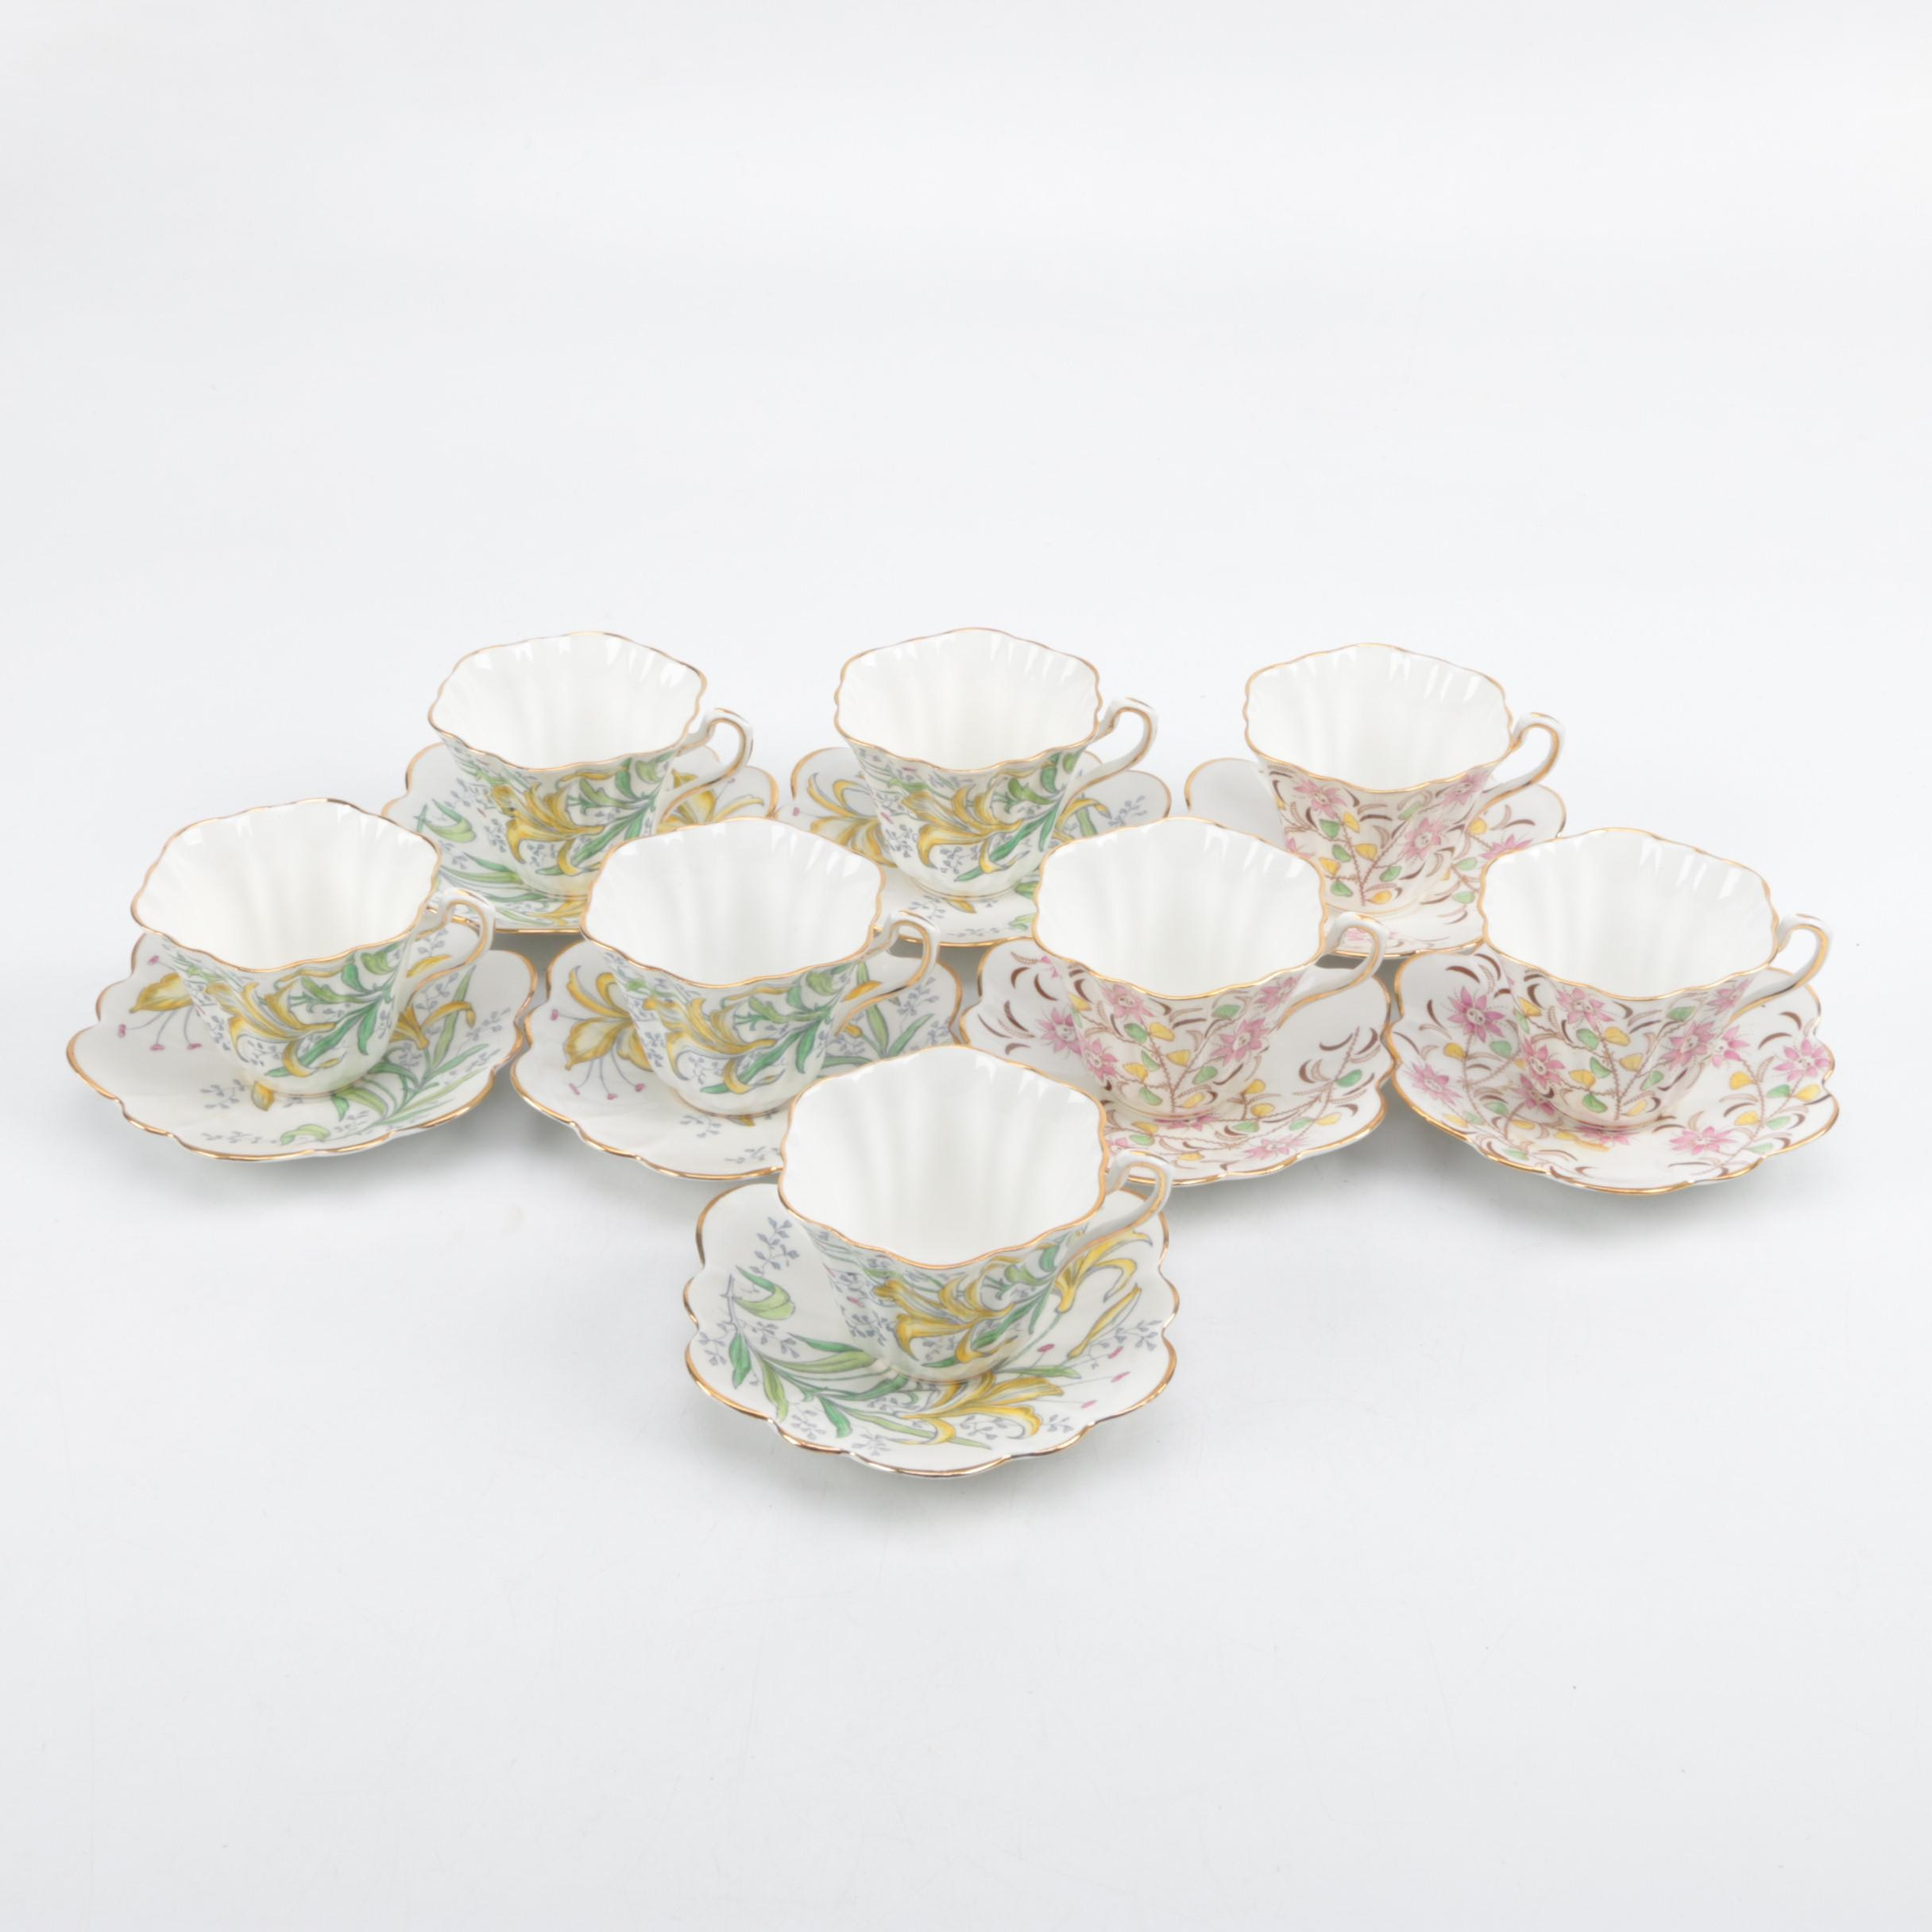 Rosina Bone China Teacups and Saucers